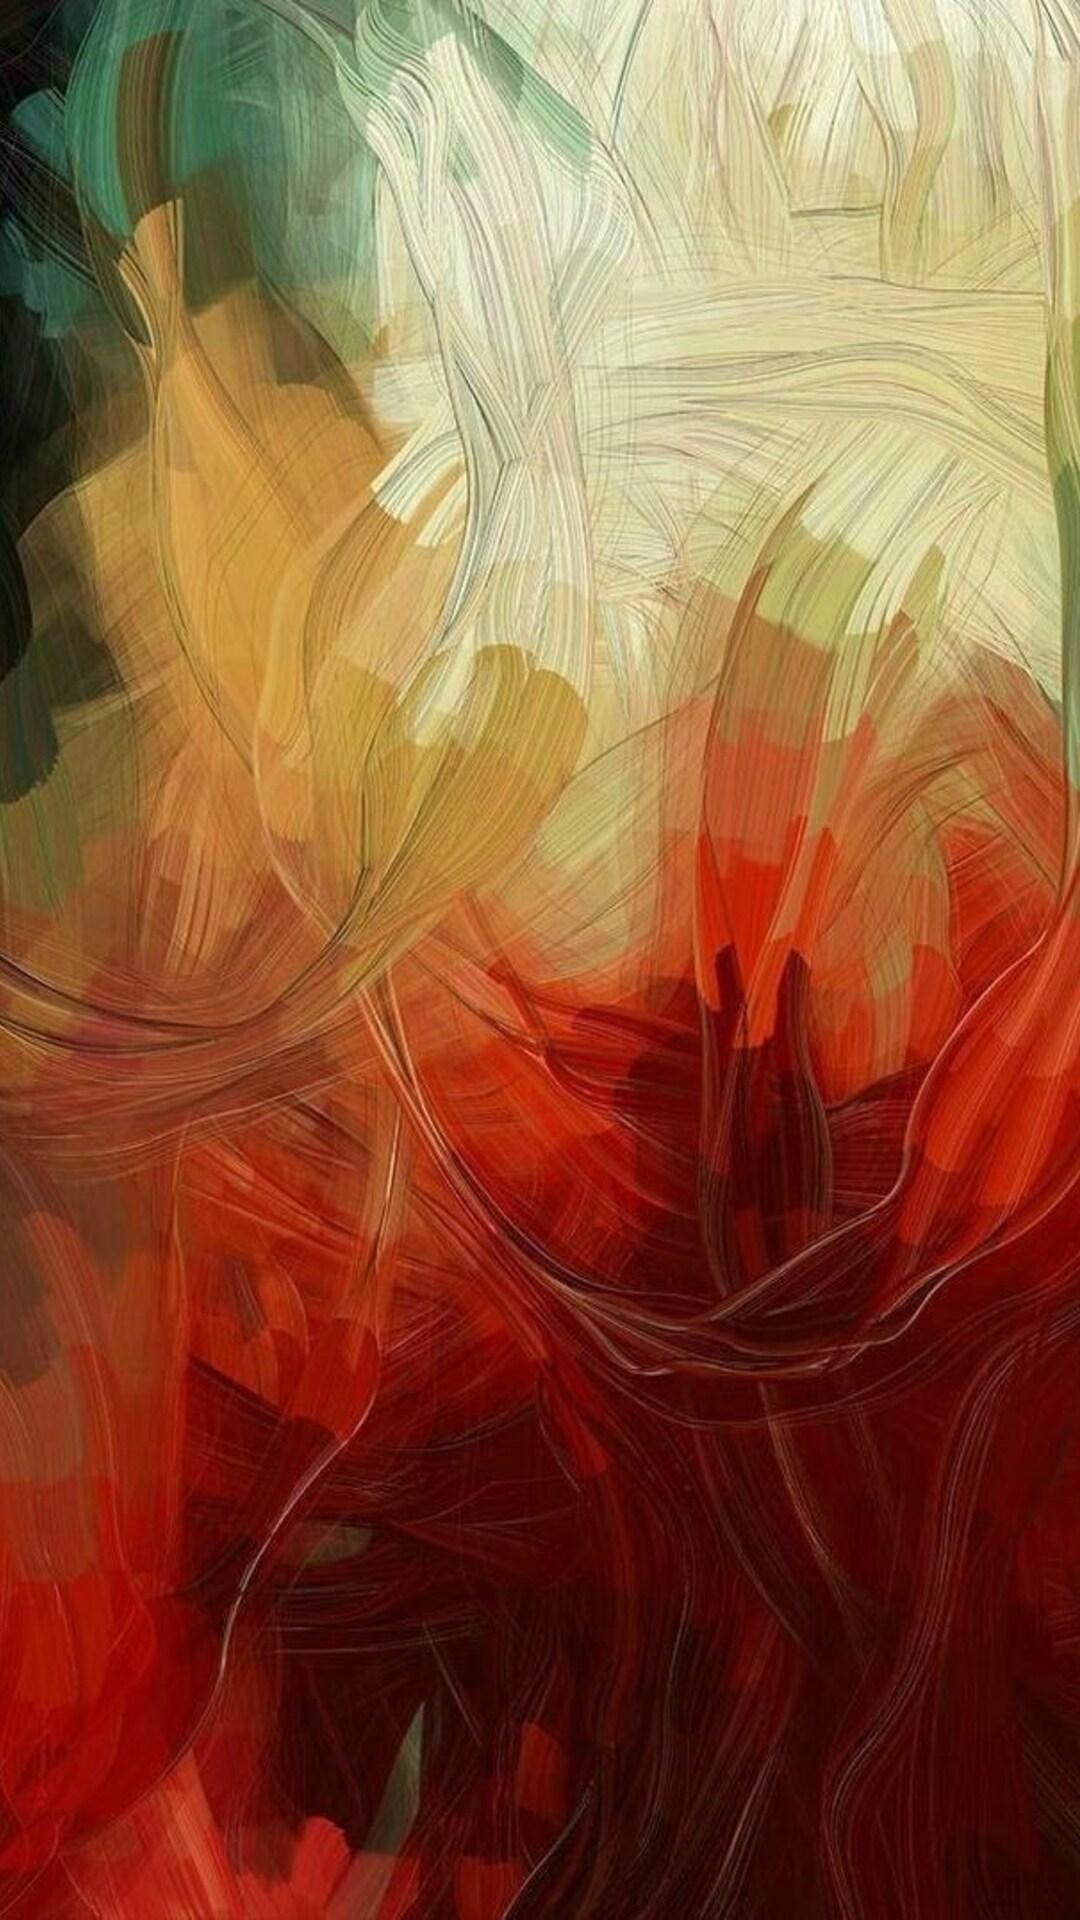 brush-stroke-abstract.jpg